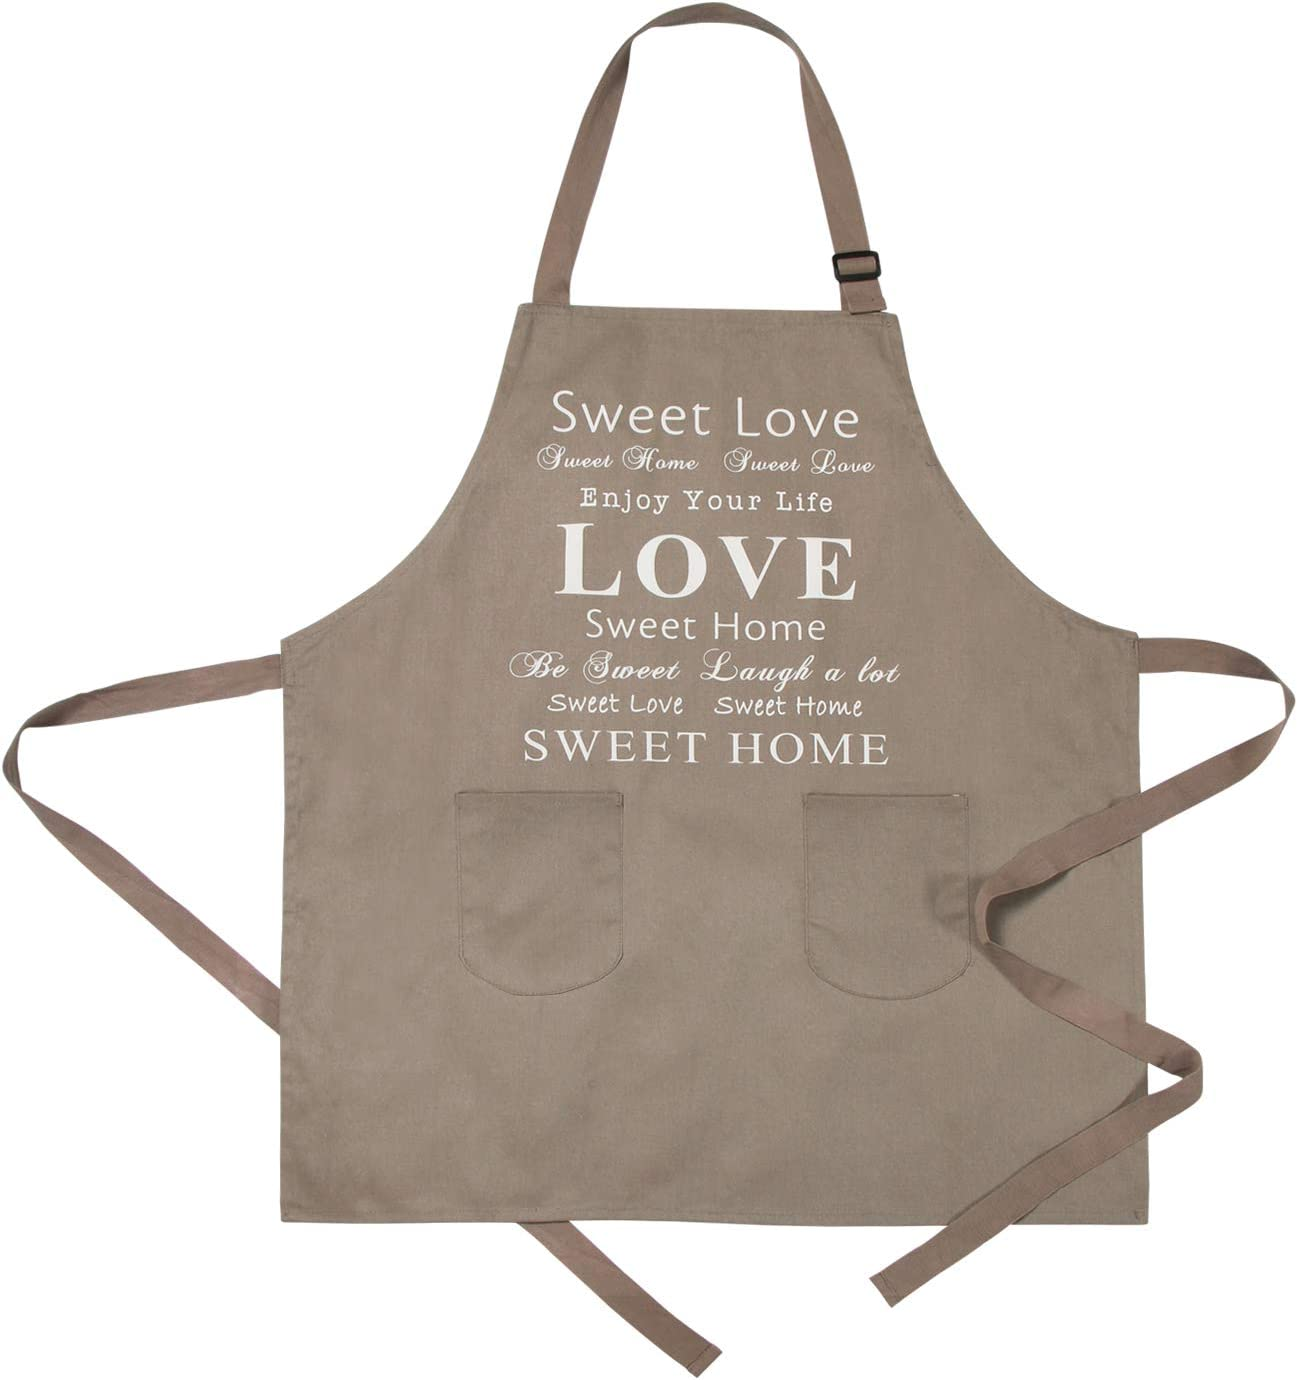 Full Aprons Chefs Check Apron Kitchen Bib Front Pocket 100/% Cotton Check Aprons